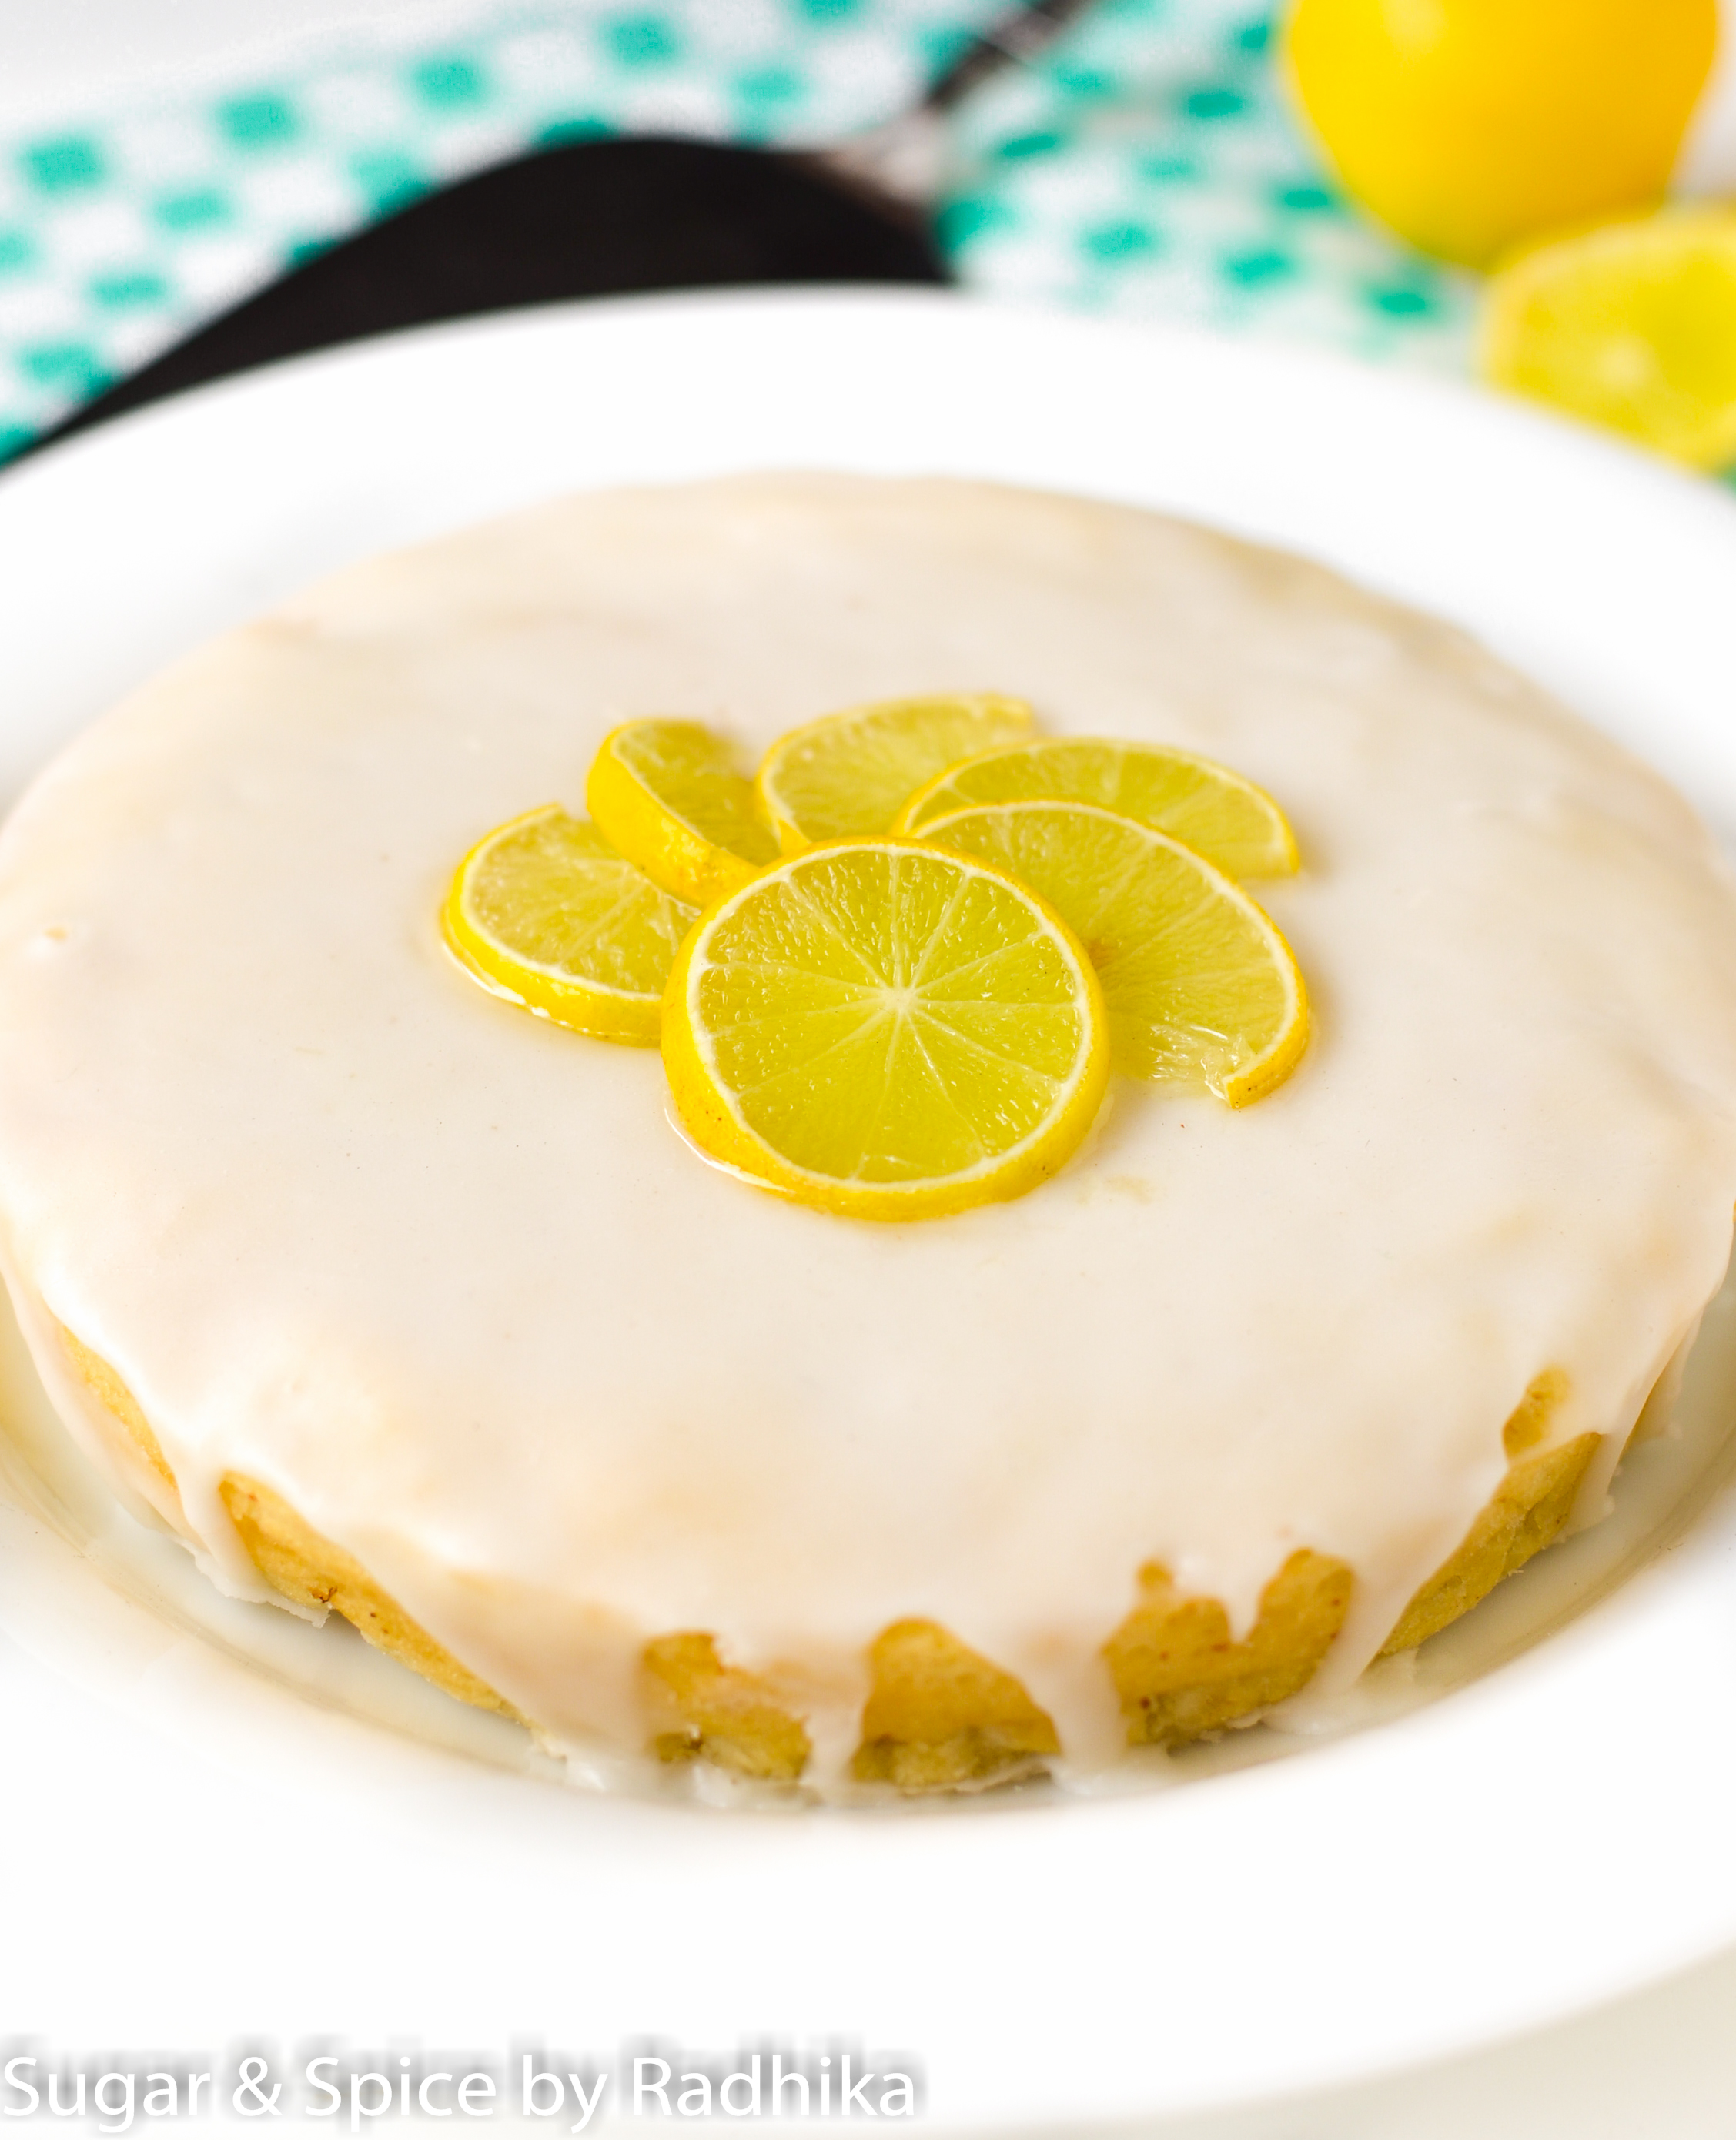 Eggless Lemon Drizzle Cake Recipe